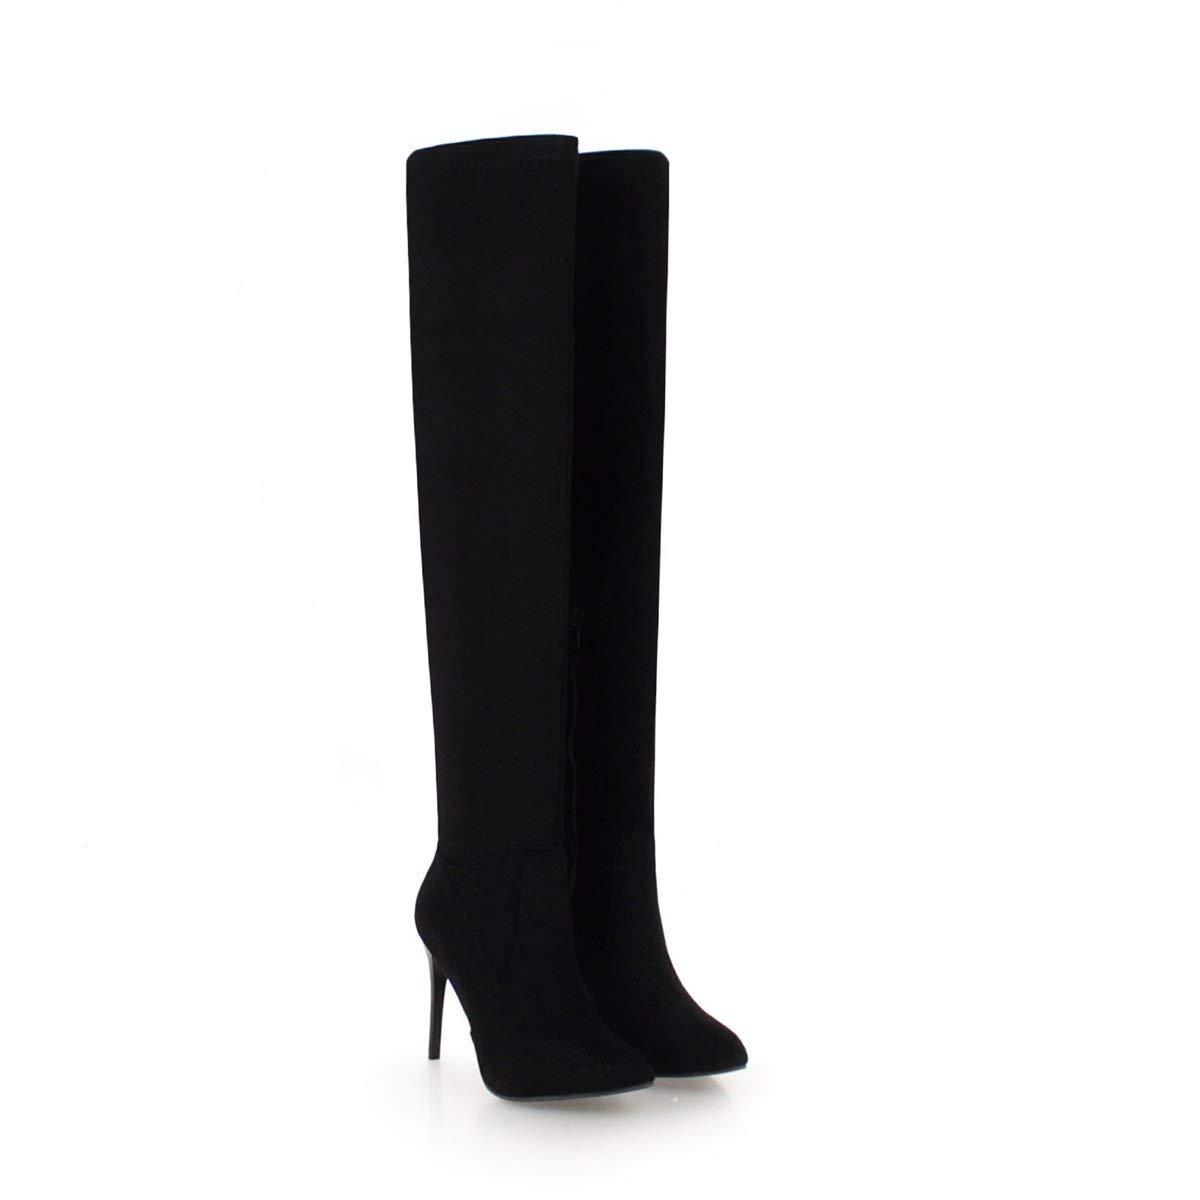 Damen Damen Damen Stiletto Heels Spitz Hohe Overknee Lange Stiefel 953163